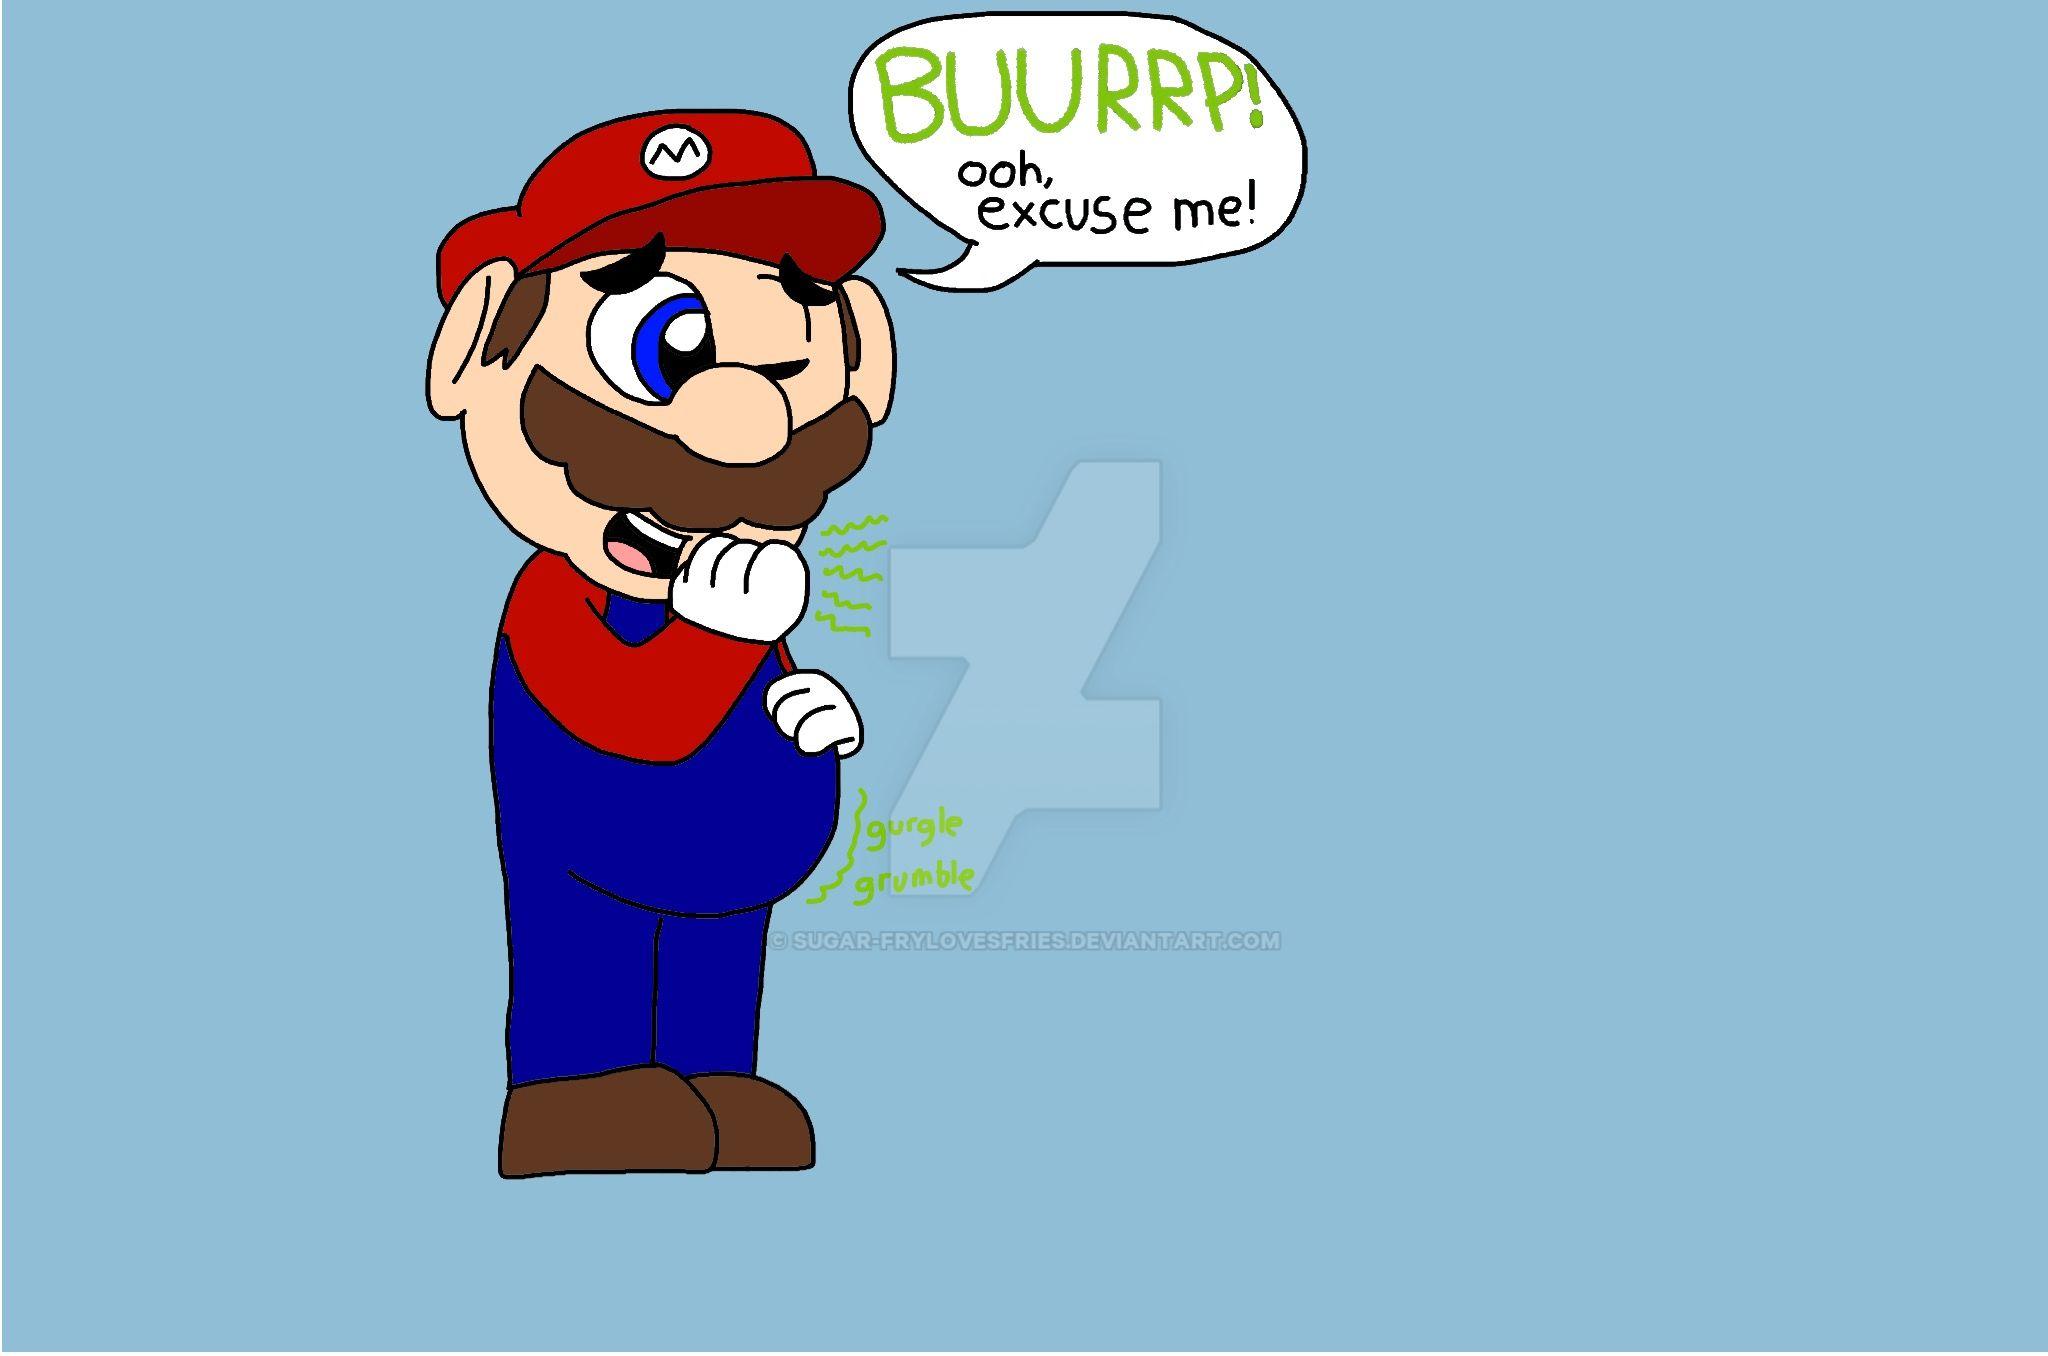 Mario burps by Sugar-Frylovesfries on DeviantArt